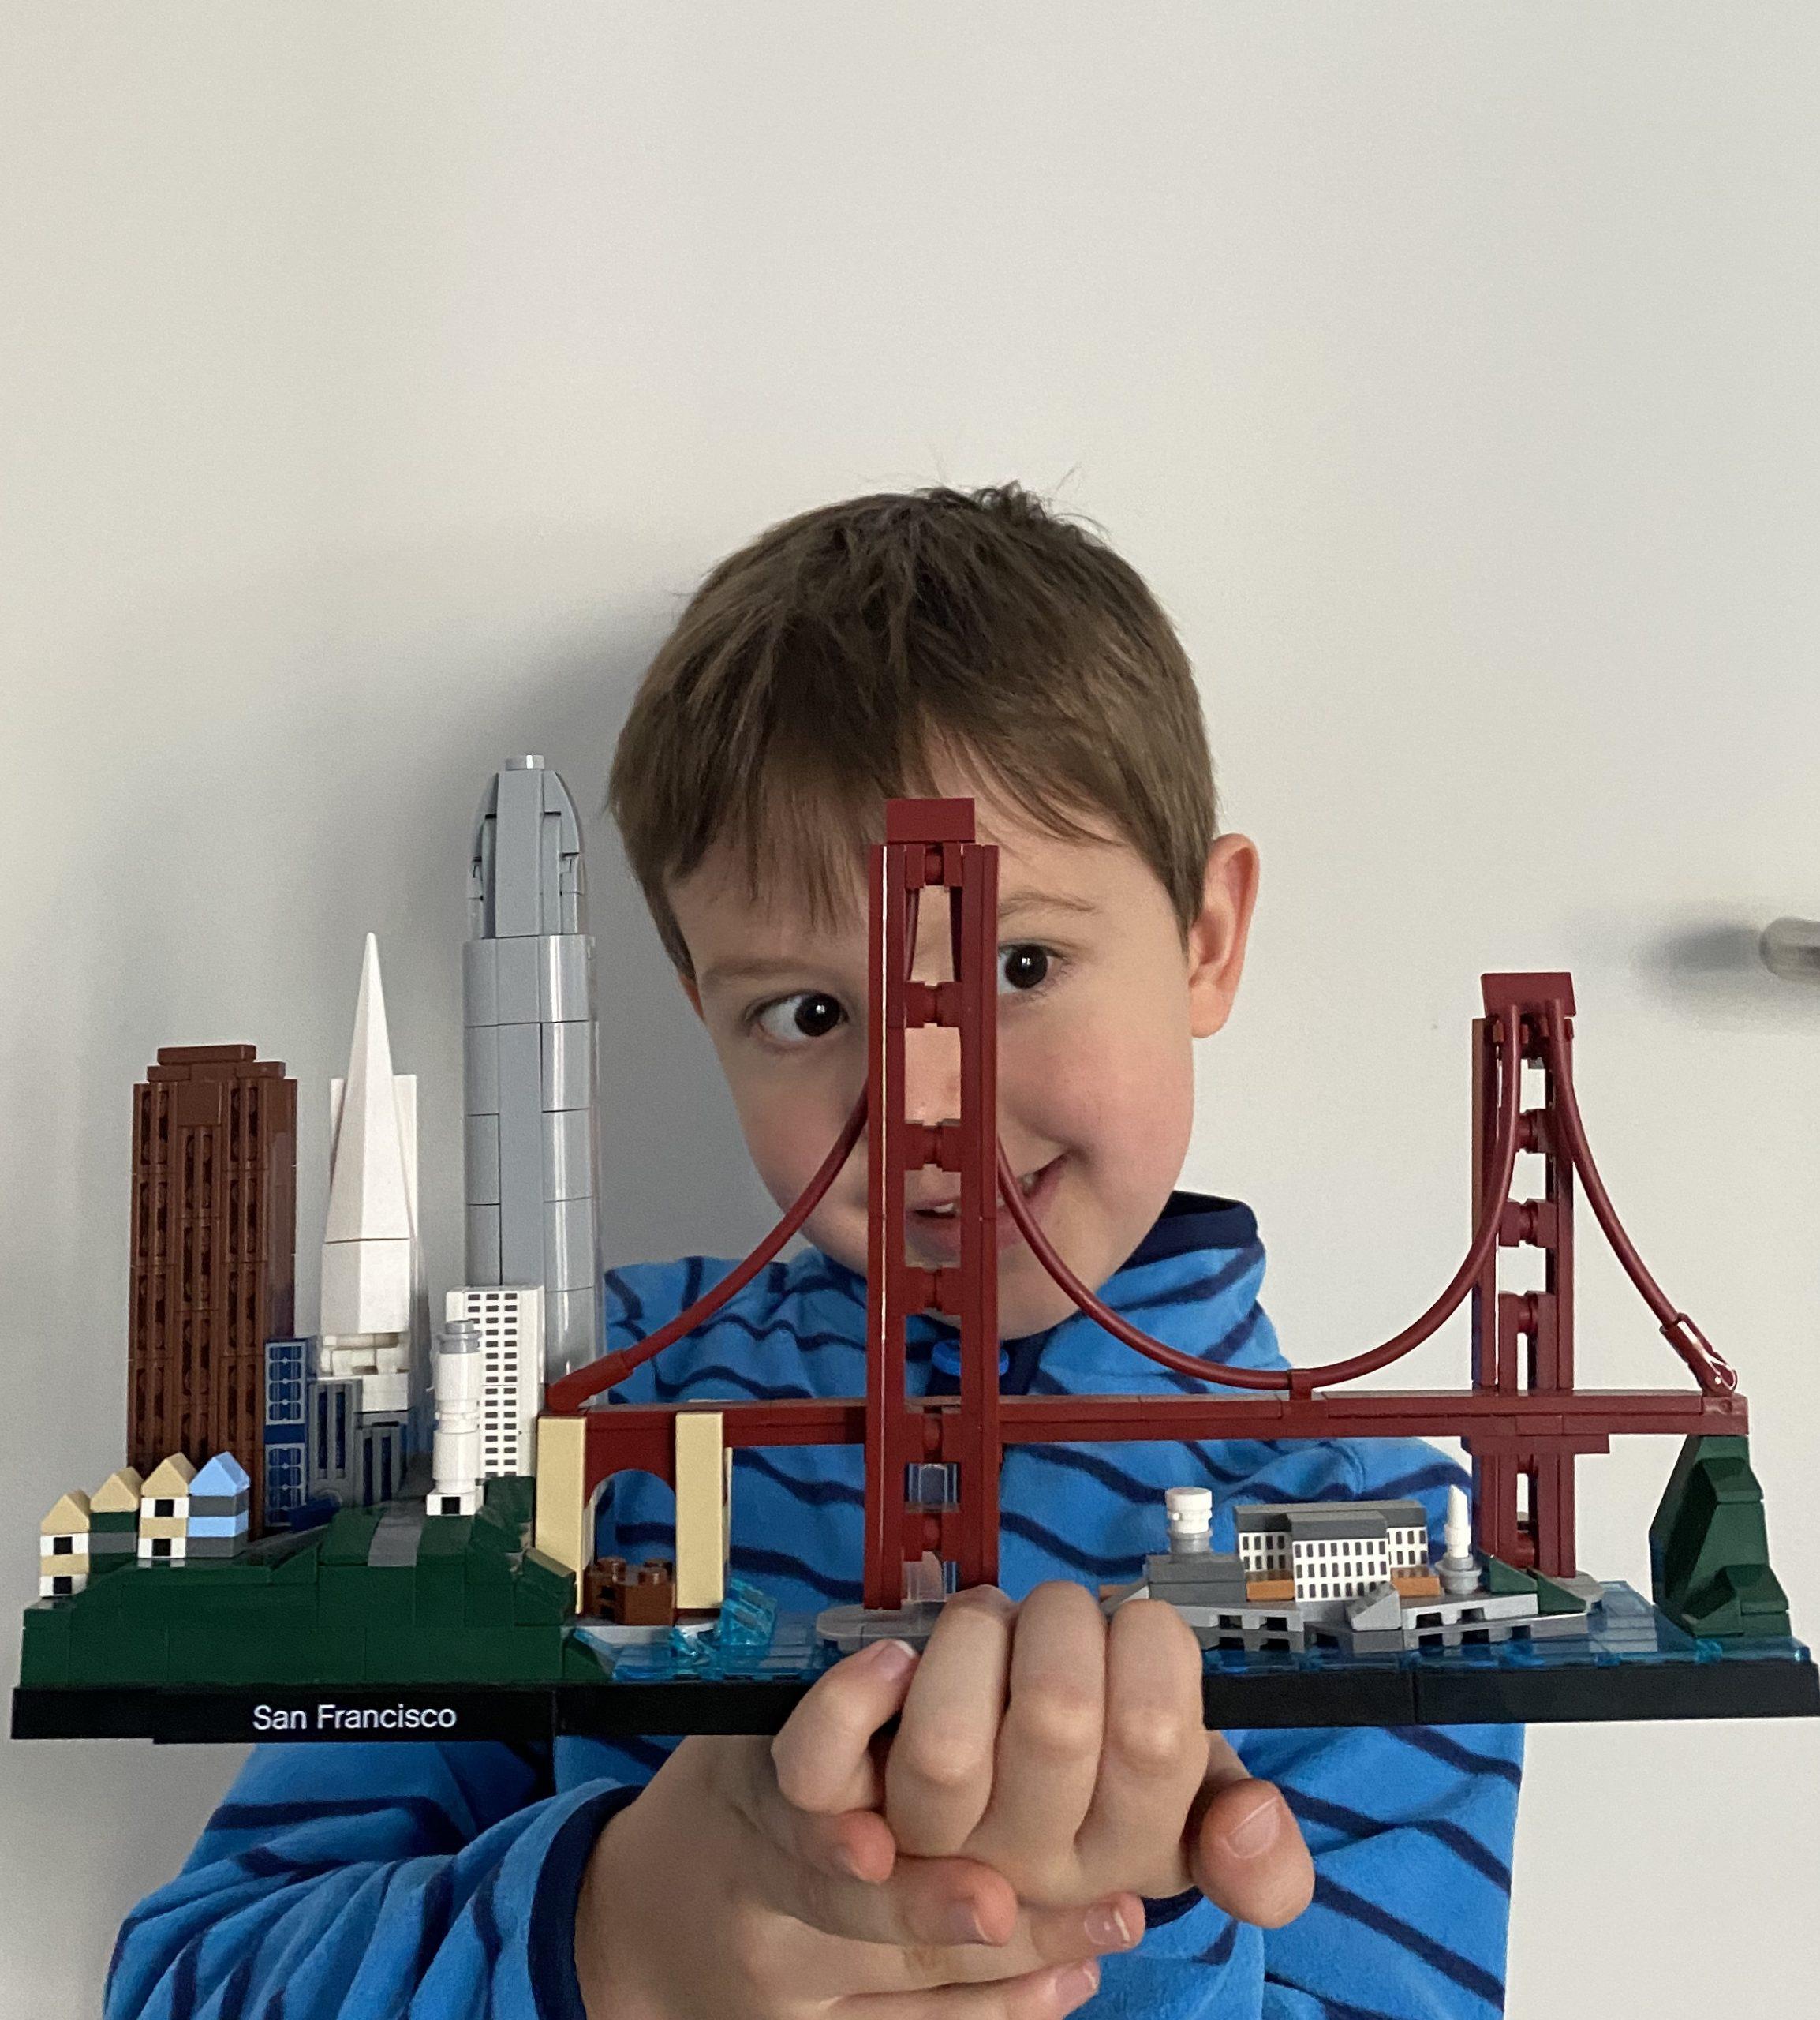 Nadja's son with San Francisco legos.